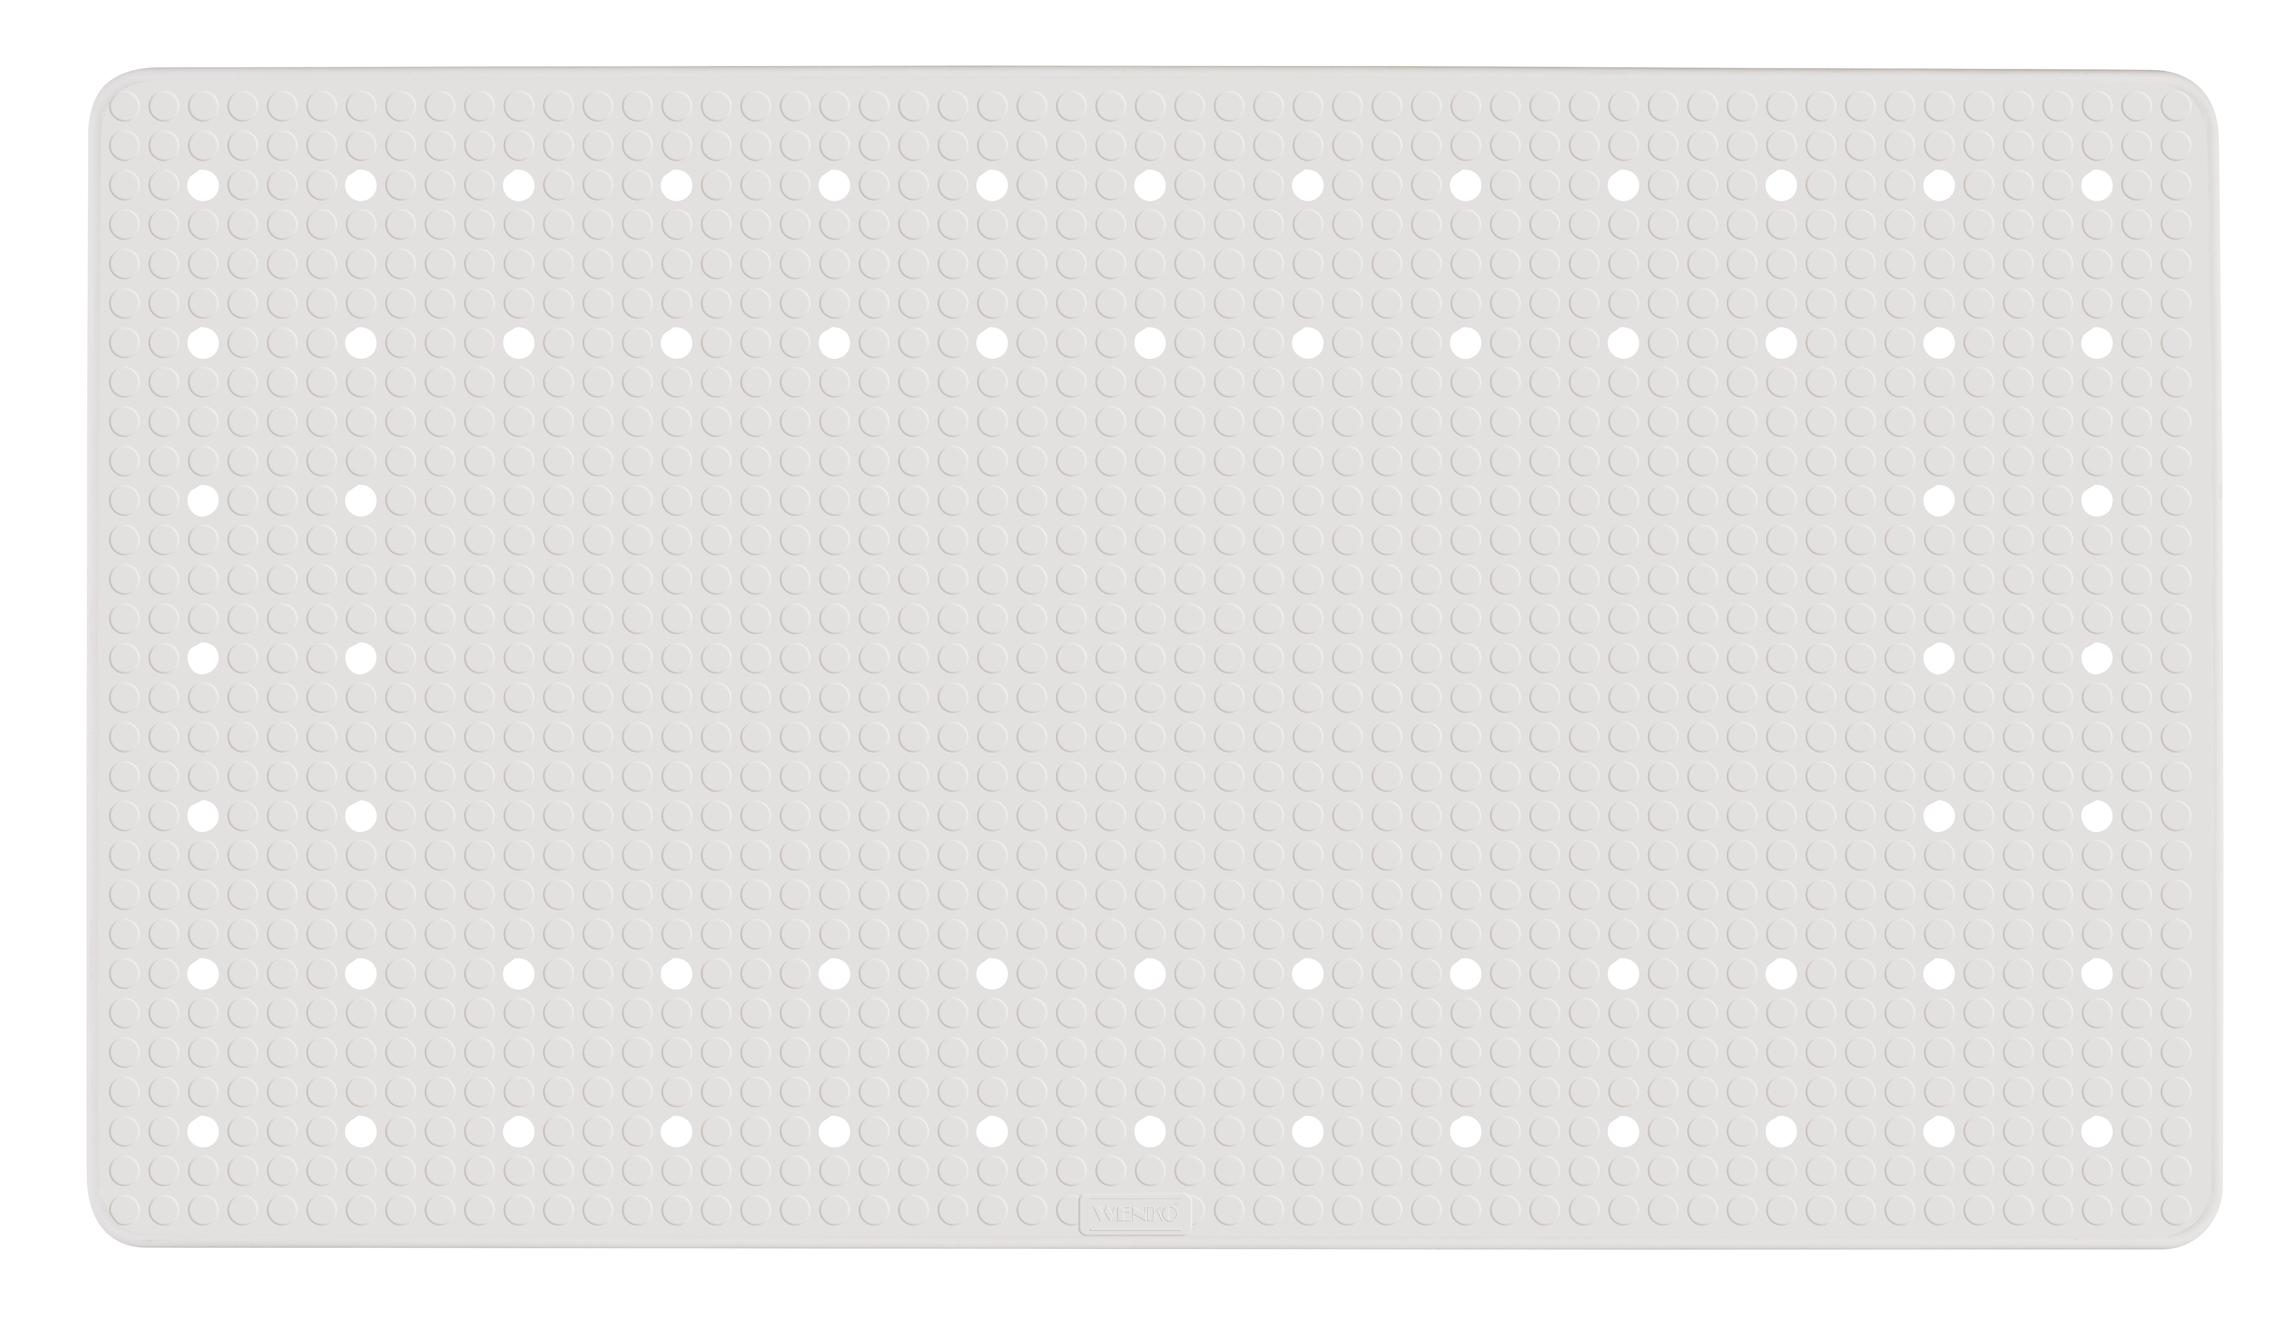 Covoras pentru baie antiderapant, din TPR, Mirasol Alb, 39 x 69 cm